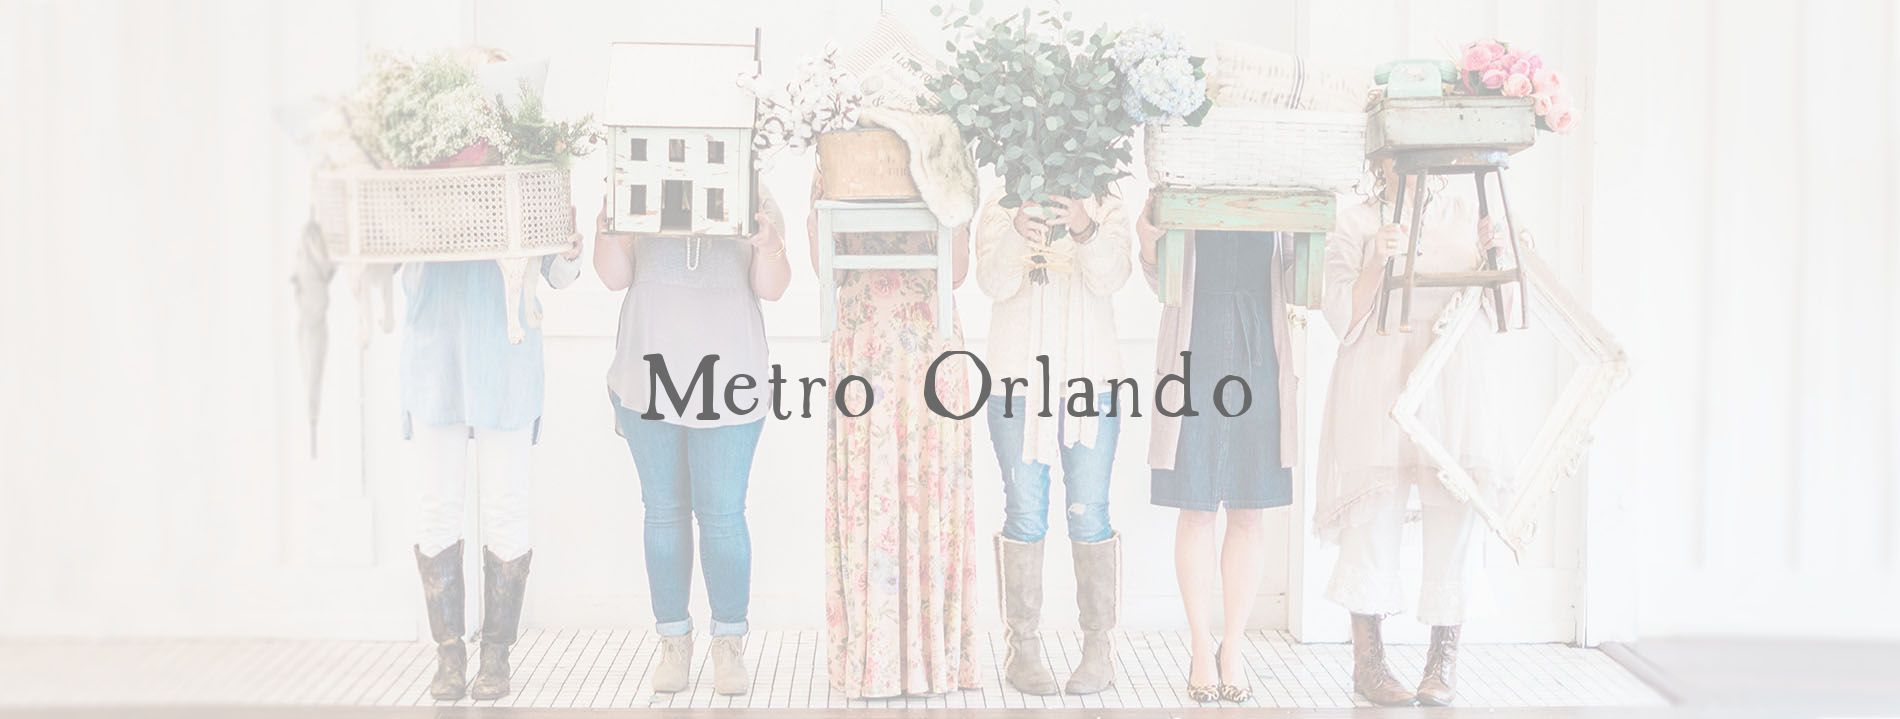 Metro Orlando